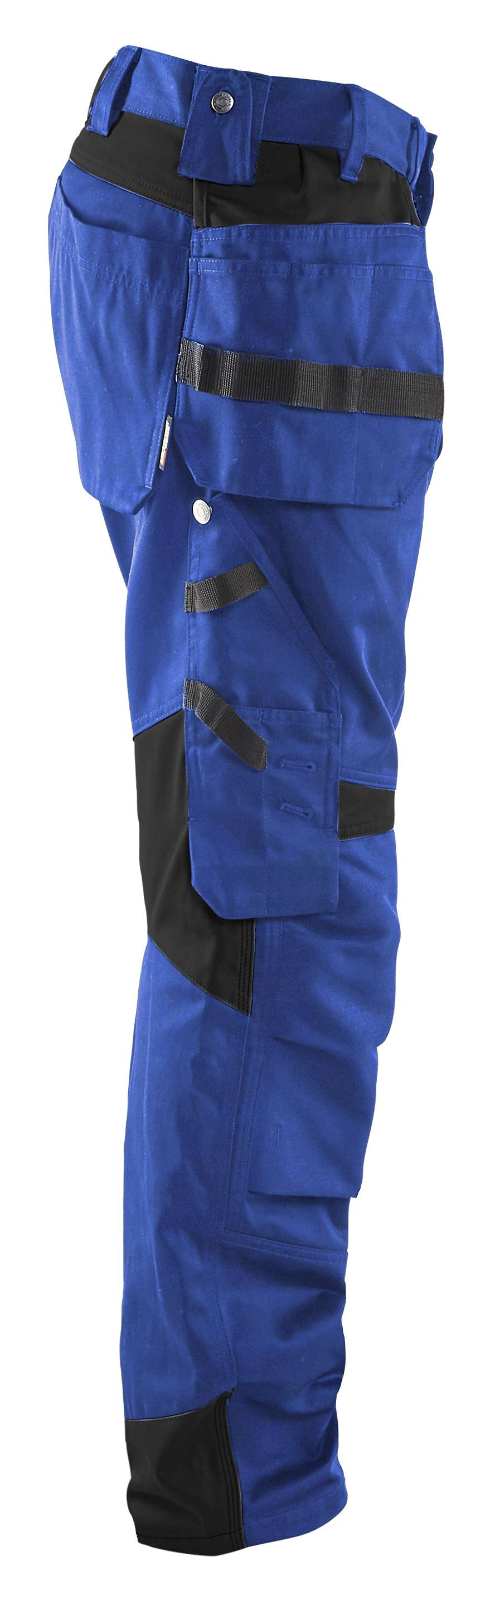 Blaklader Werkbroeken 15551860 korenblauw-zwart(8599)